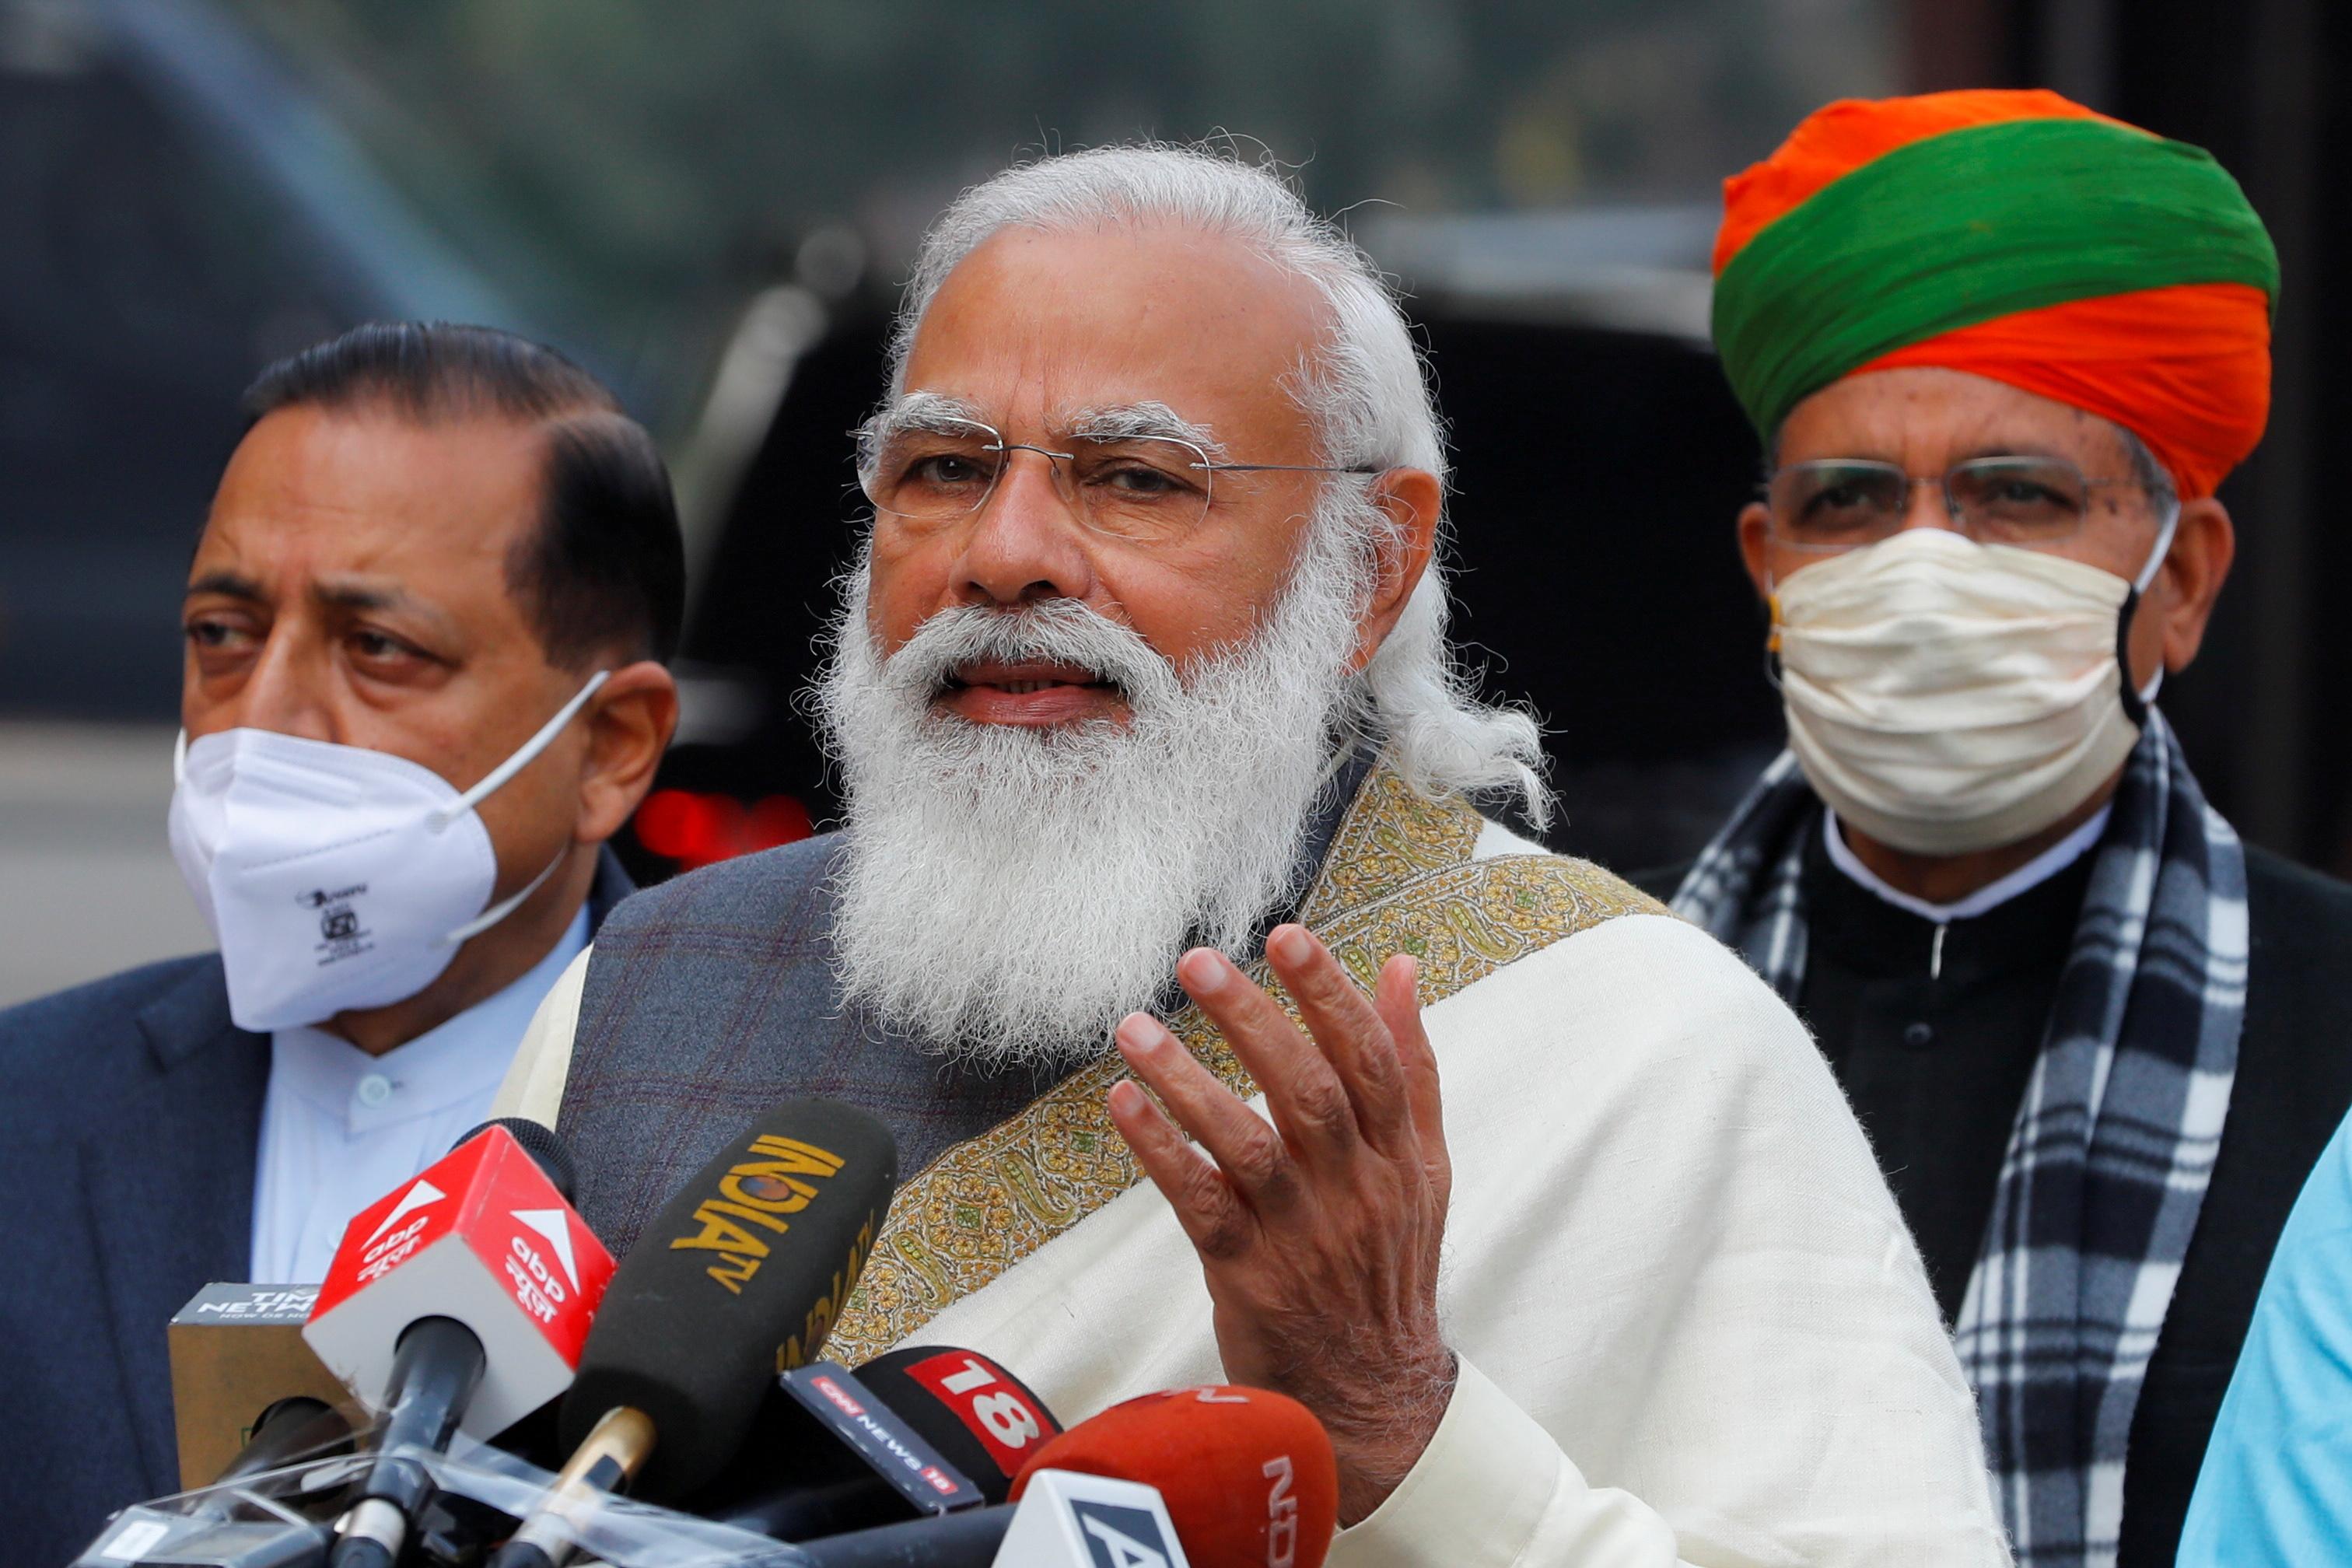 India's Prime Minister Narendra Modi in New Delhi, India, January 29, 2021. REUTERS/Adnan Abidi/File Photo